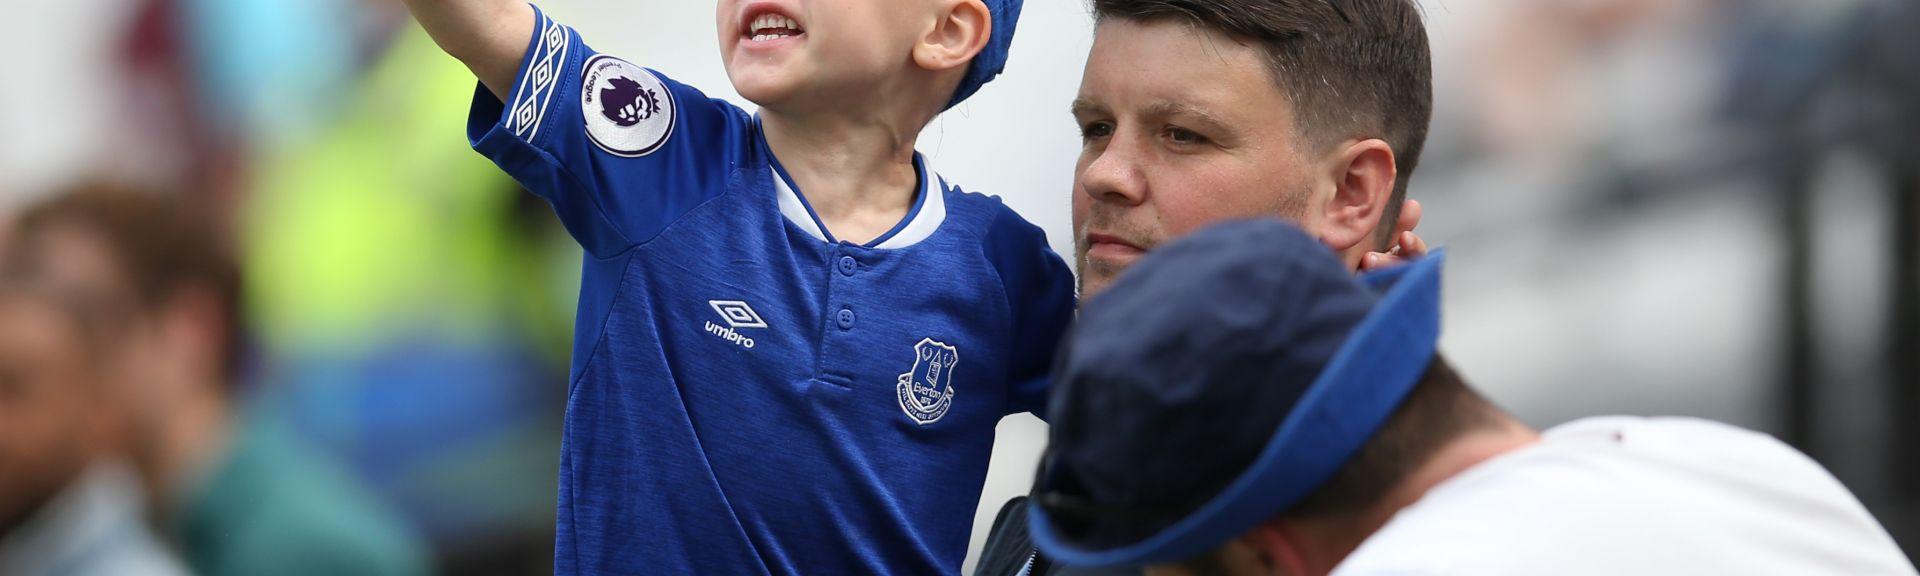 Everton Supporter